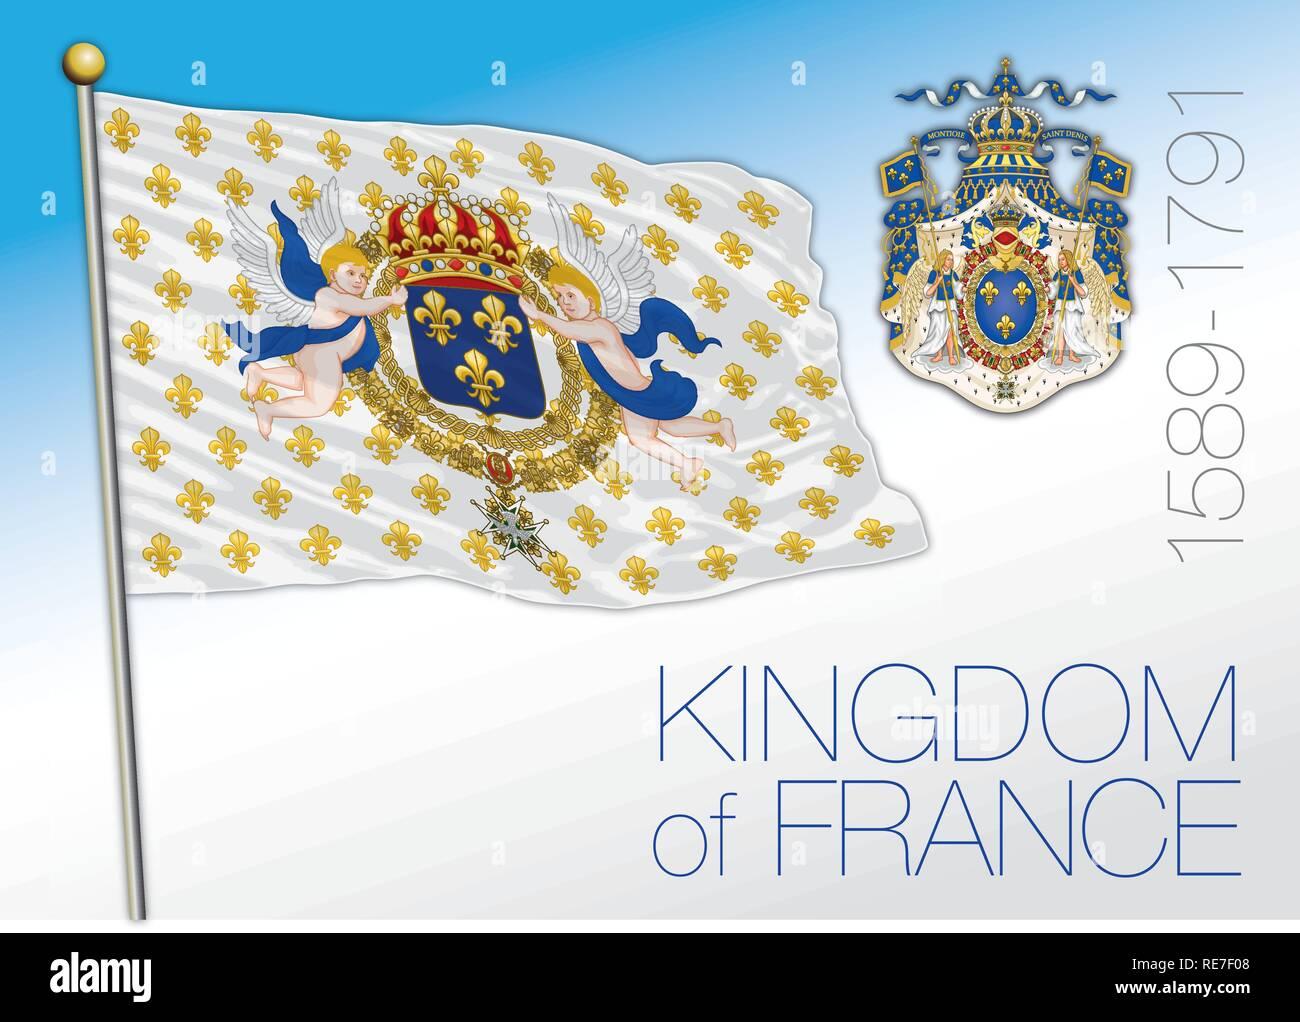 Kingdom of France, historical flag - Stock Vector